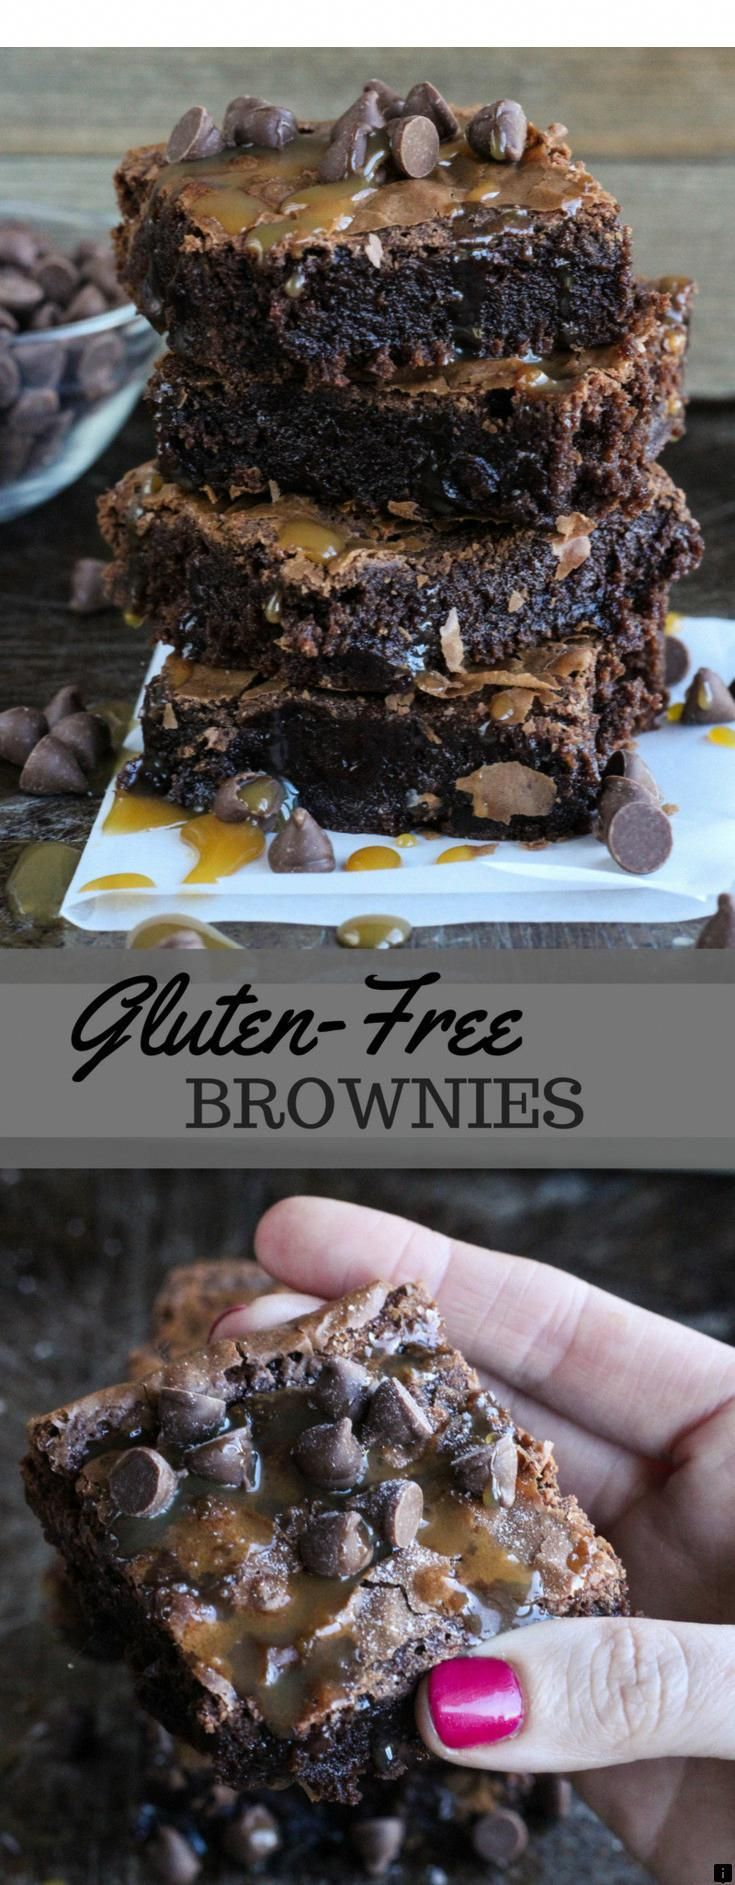 gluten dairy free cakes near me